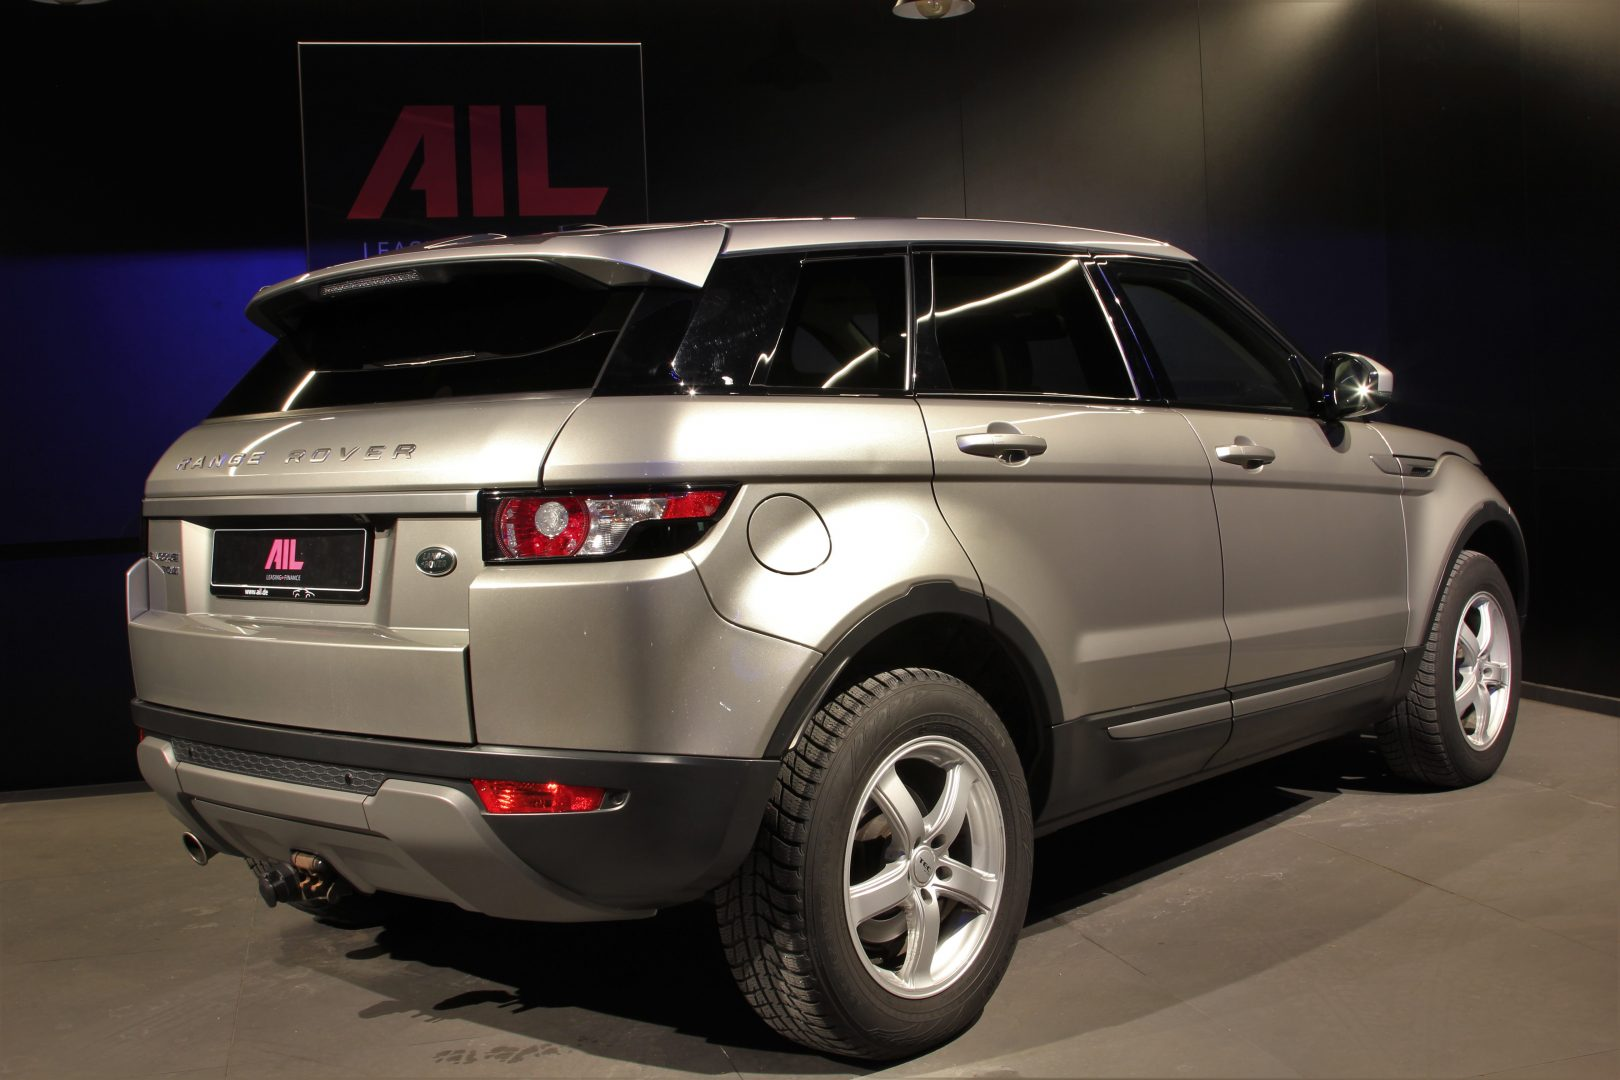 AIL Land Rover Range Rover Evoque Pure 12